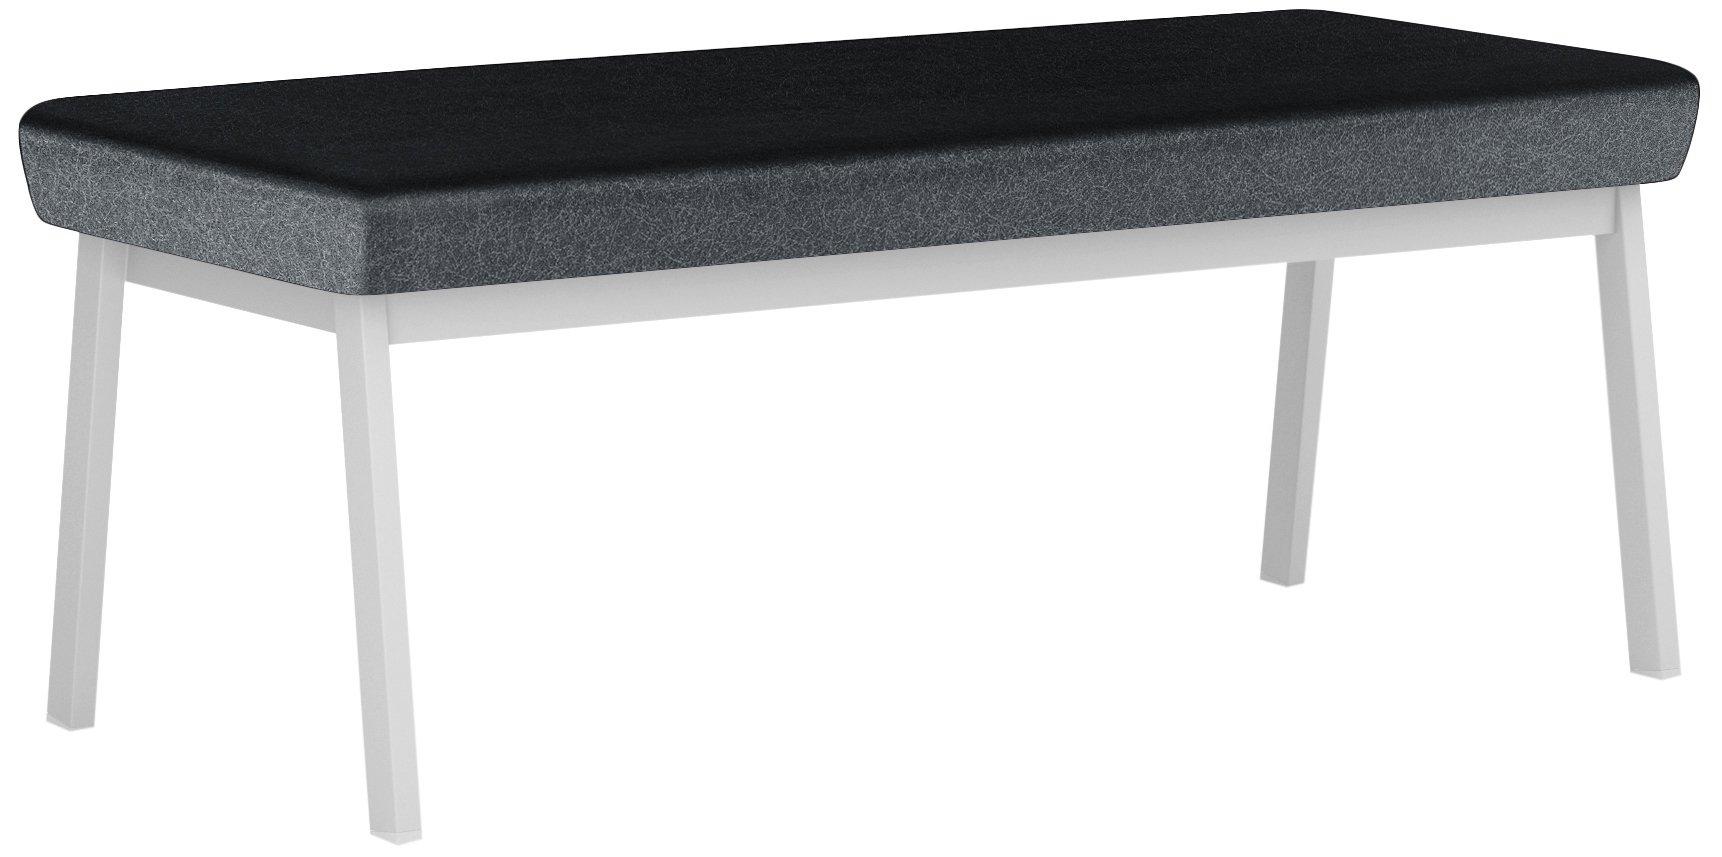 Newport Healthcare Vinyl 2-Seat Bench, Renaissance Carbon, Silver